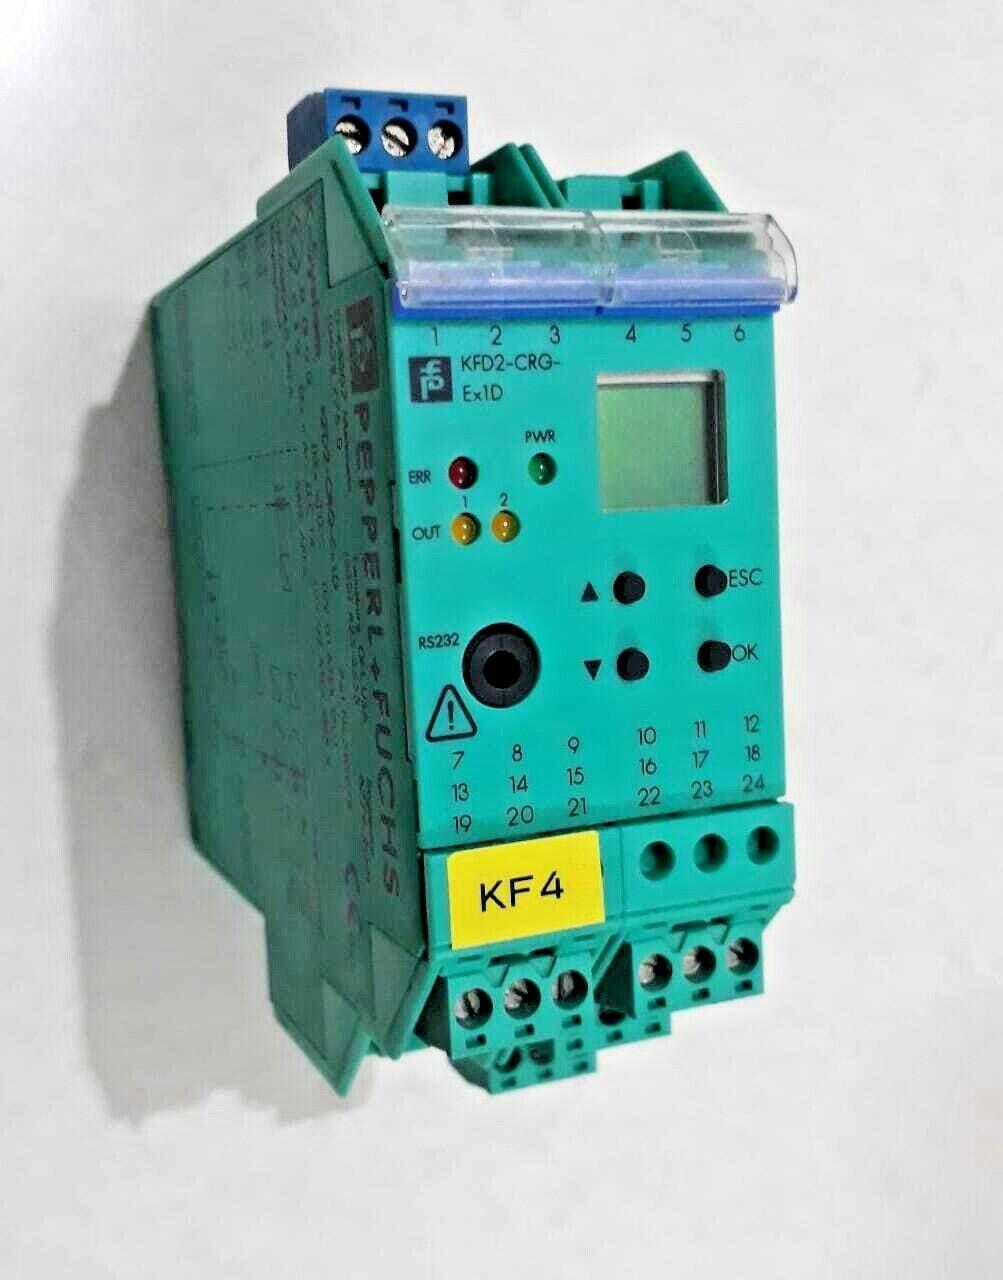 IDC-50-1k Pepperl+Fuchs RFID Transponder 250 kHz